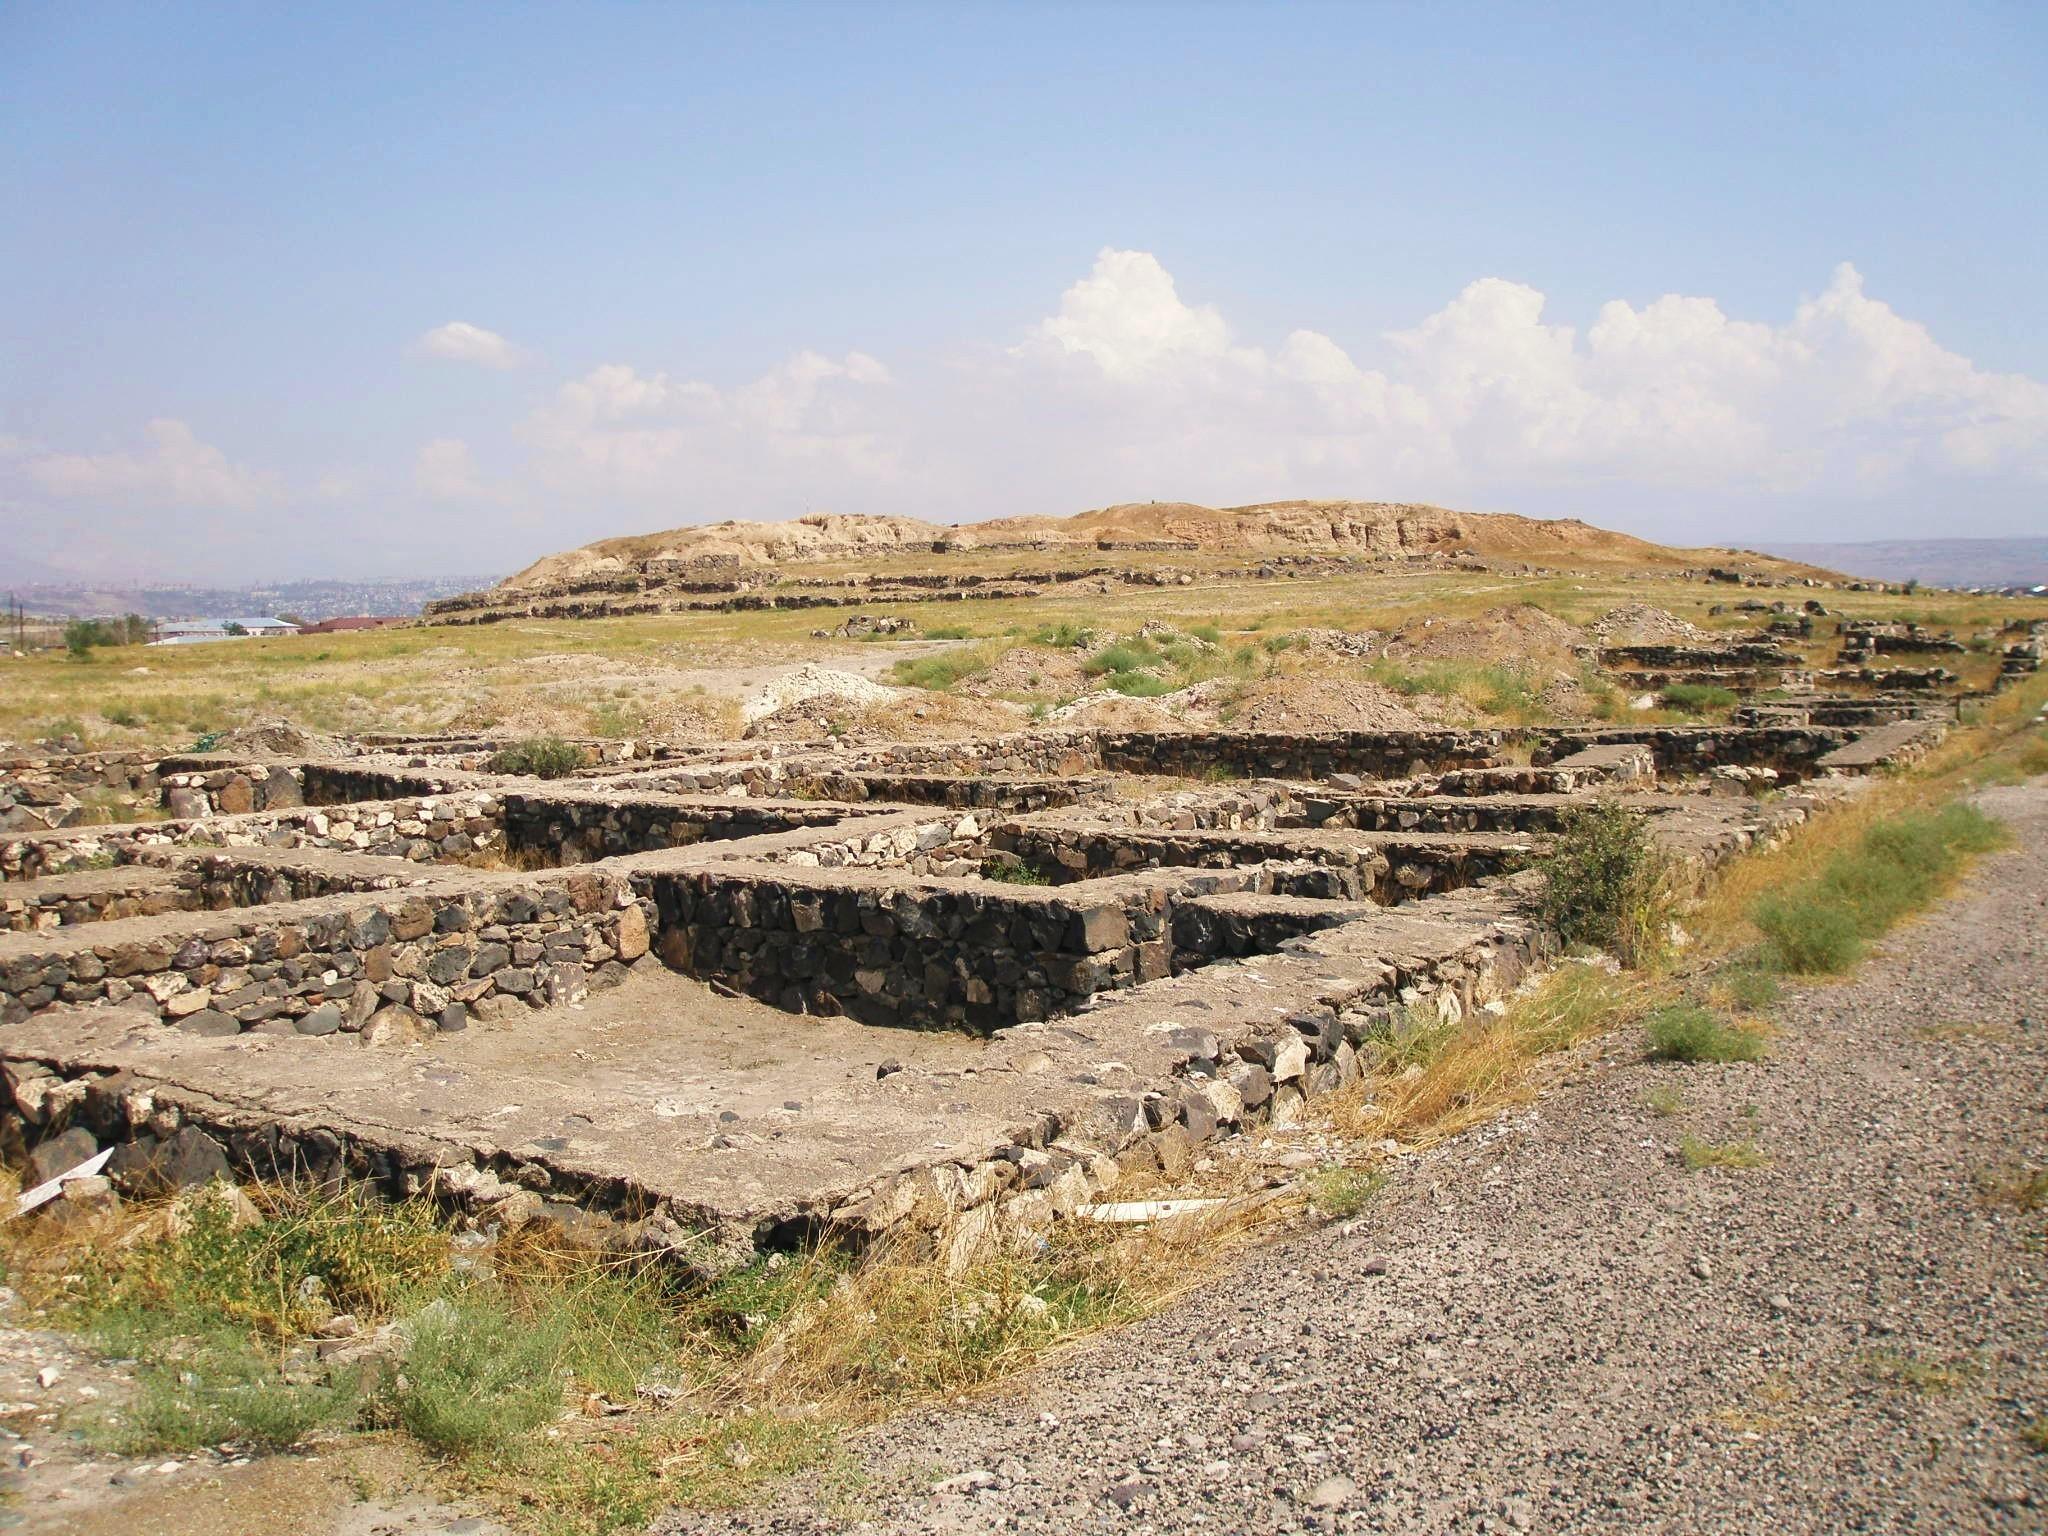 https://upload.wikimedia.org/wikipedia/commons/8/81/Karmir_Blur_Town.JPG